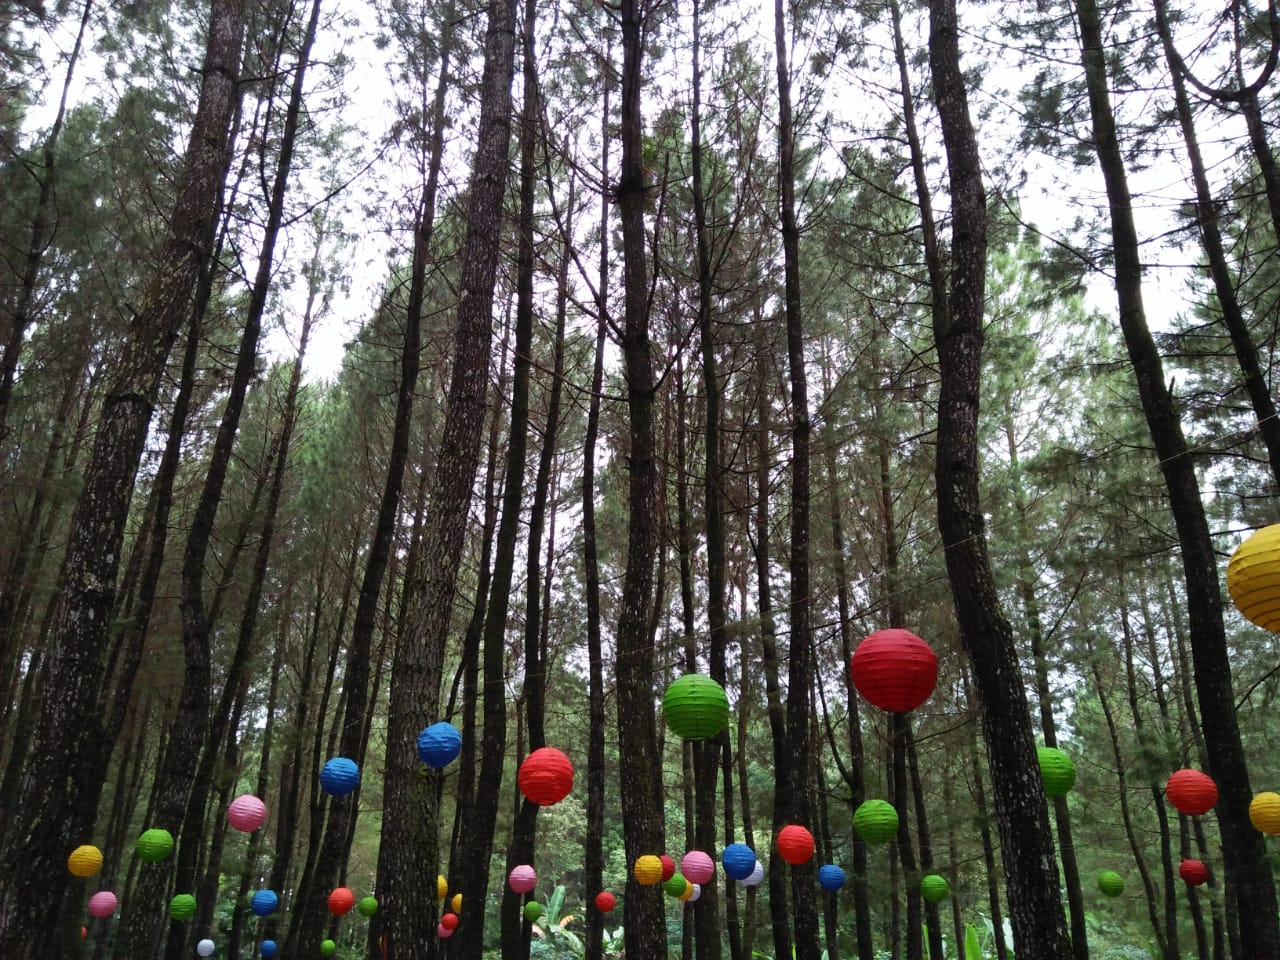 Wisata Pohon Pinus Banyuwangi. Foto: Gita Welastiningtias